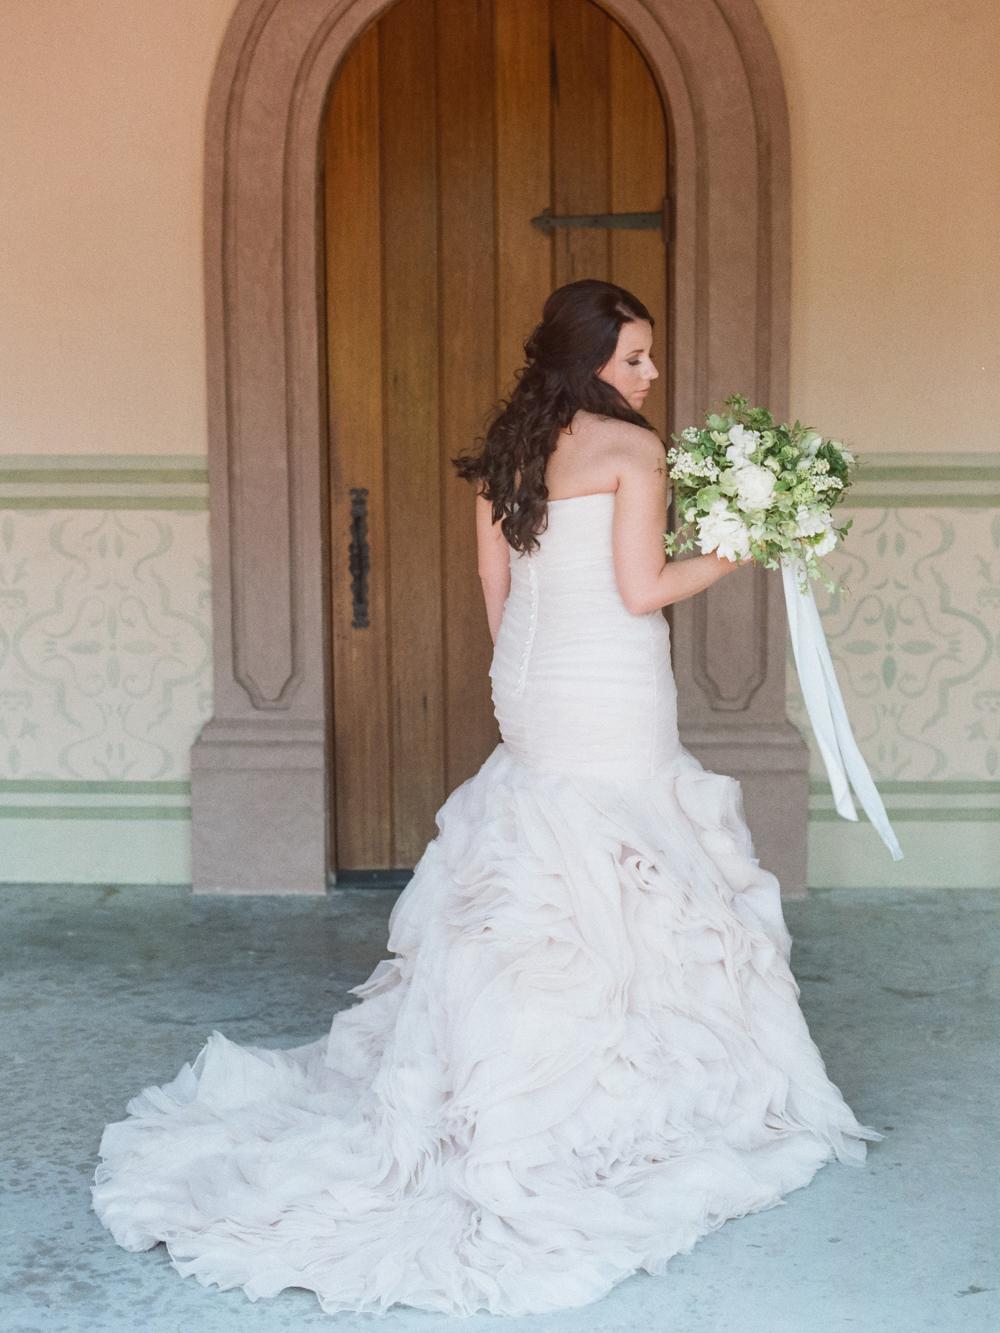 elopement bouquet ideas - Christine Gosch - film photographer - elopement photographer - intimate wedding photographer